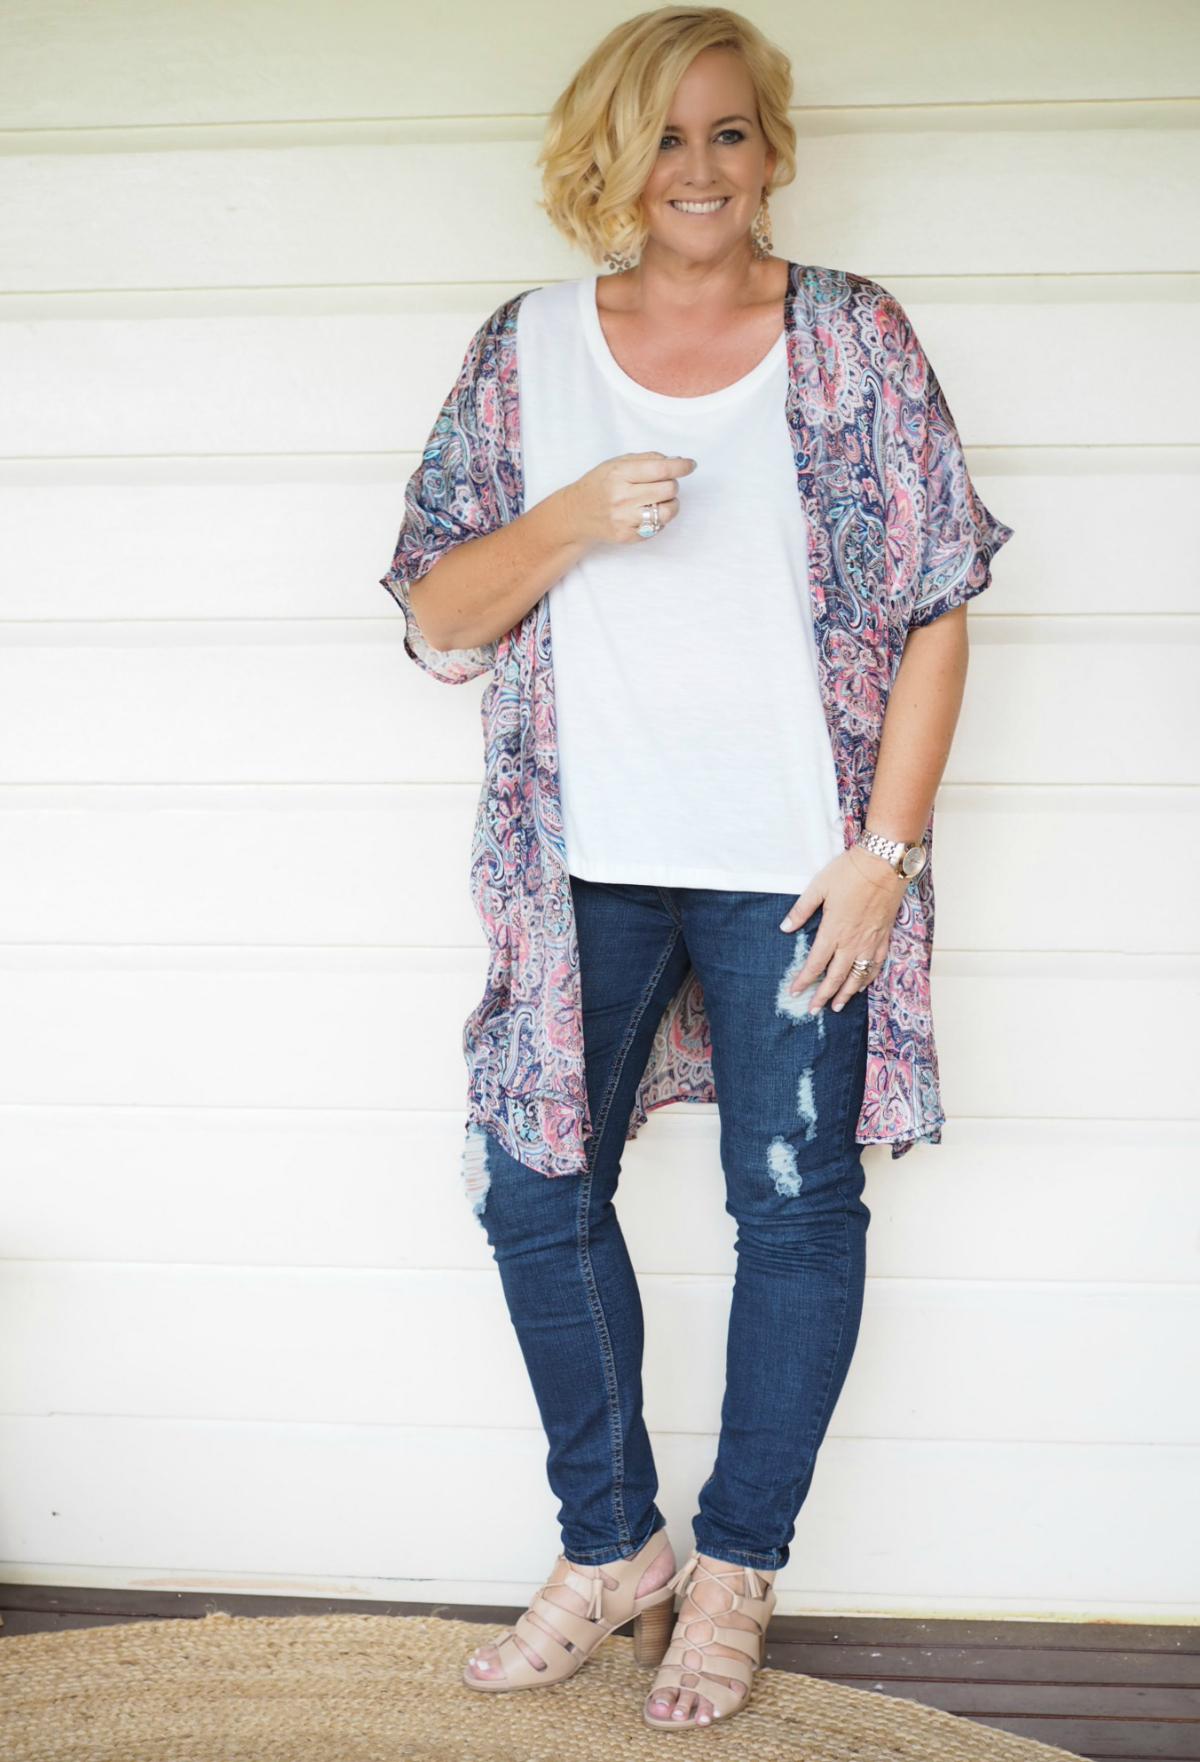 Iland Co kimono (medium) | Sassind tee | Bohemian Traders jeans | FRANKiE4 Footwear EMMA heels